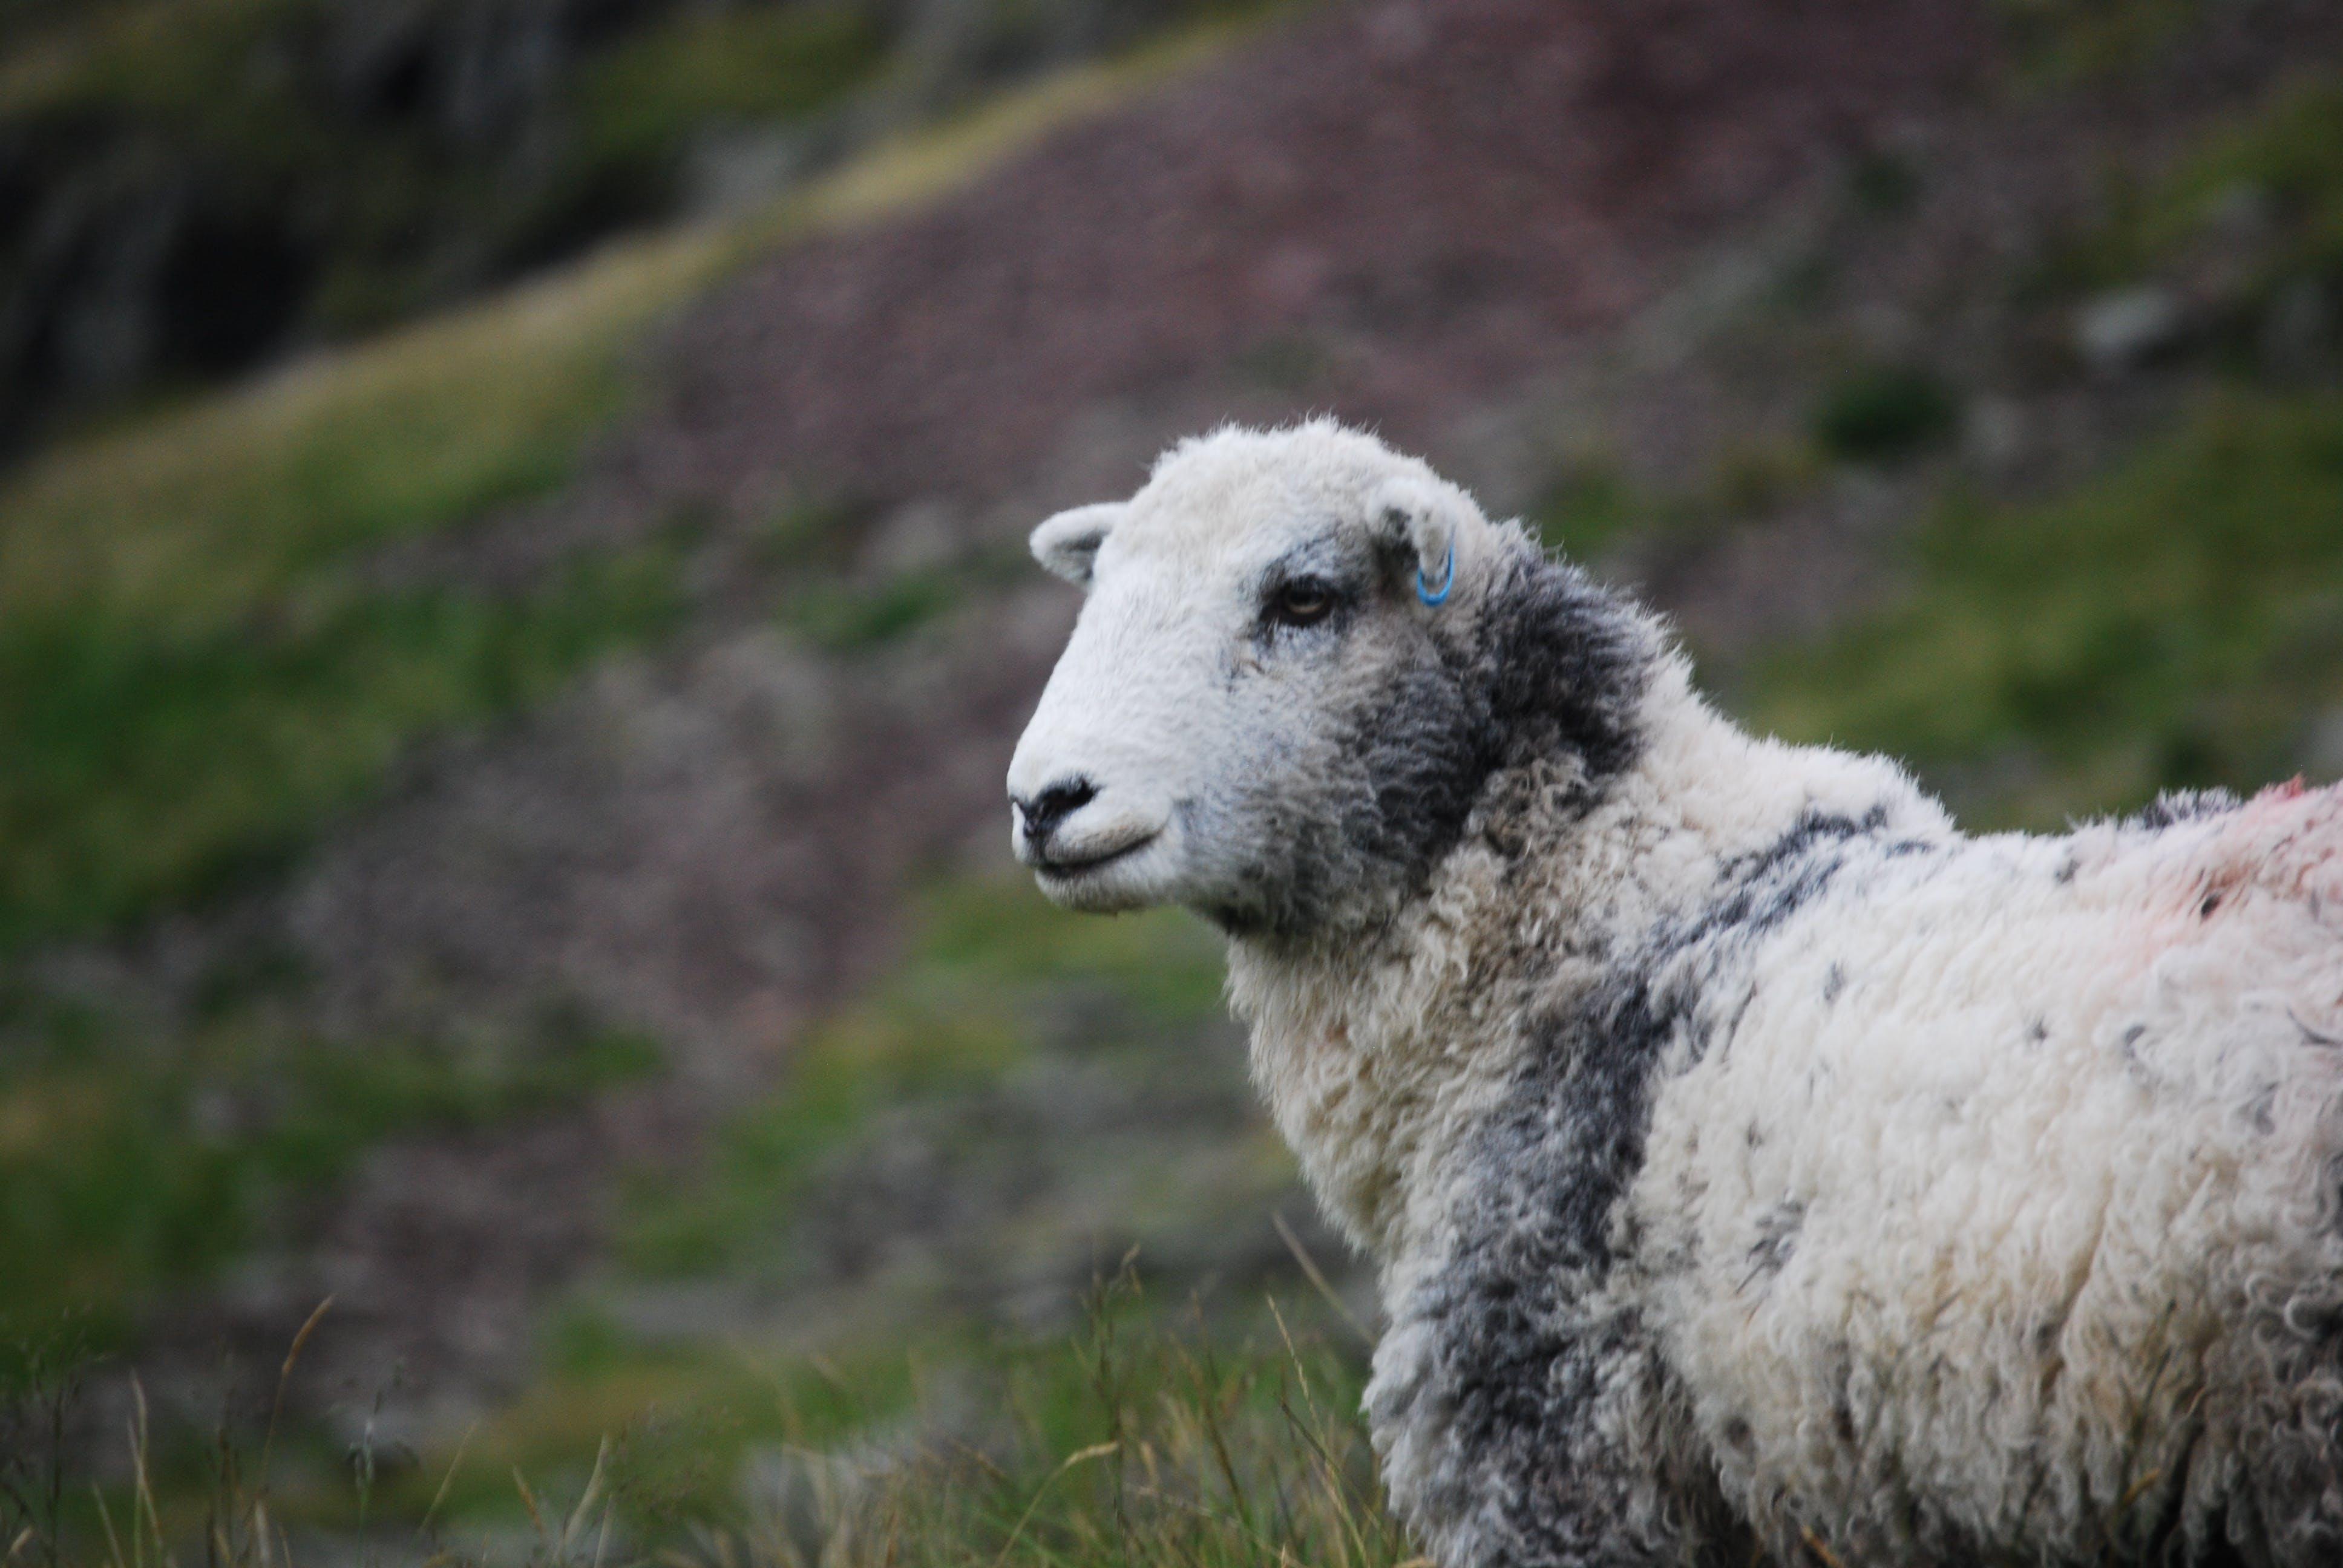 White and Gray Sheep